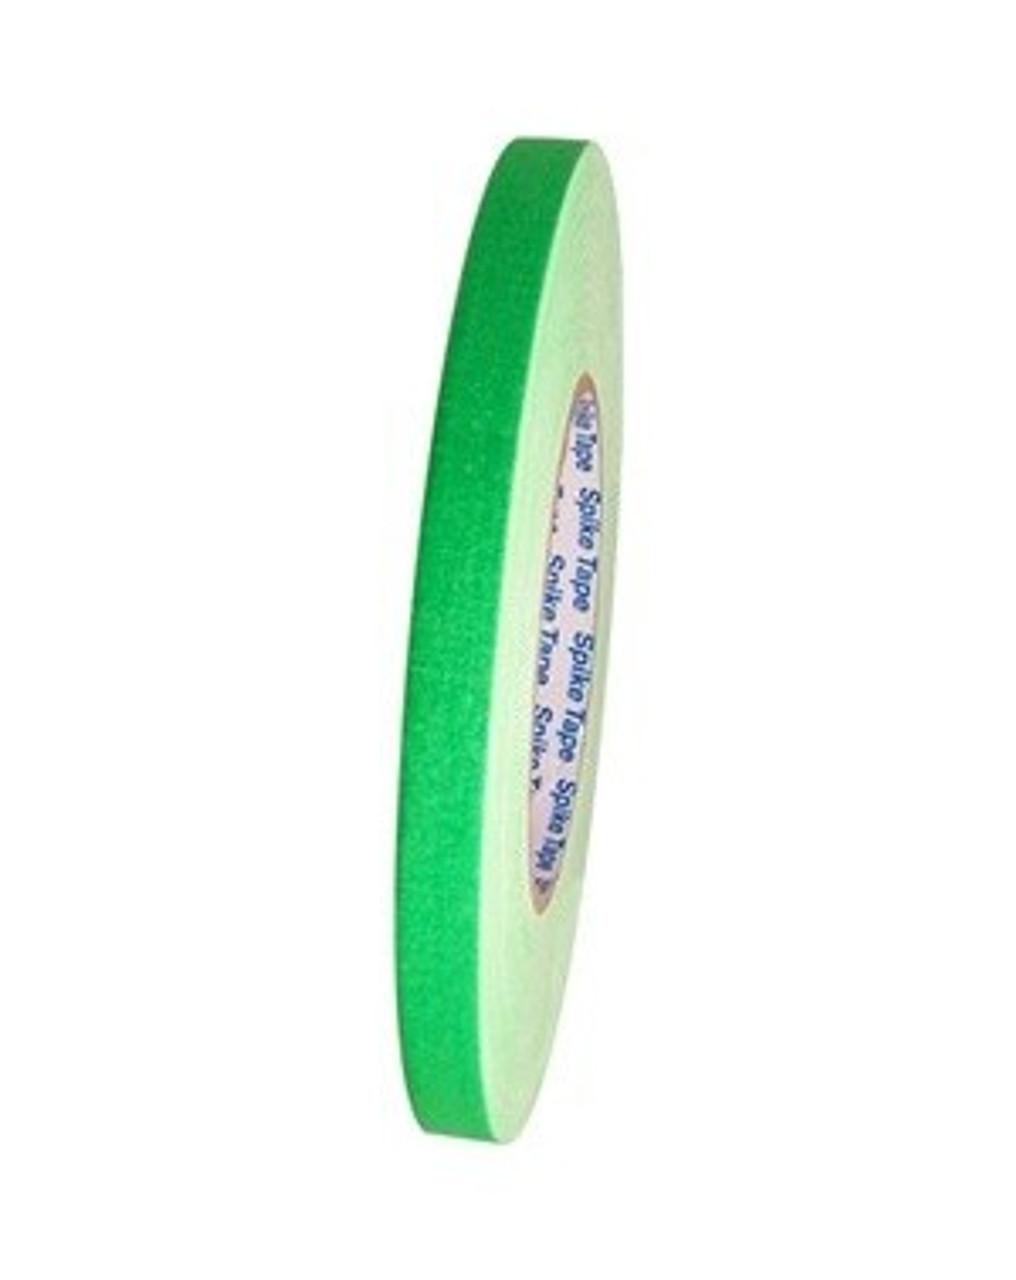 "Spike Tape - FL Green 1"" x 50 Yds"